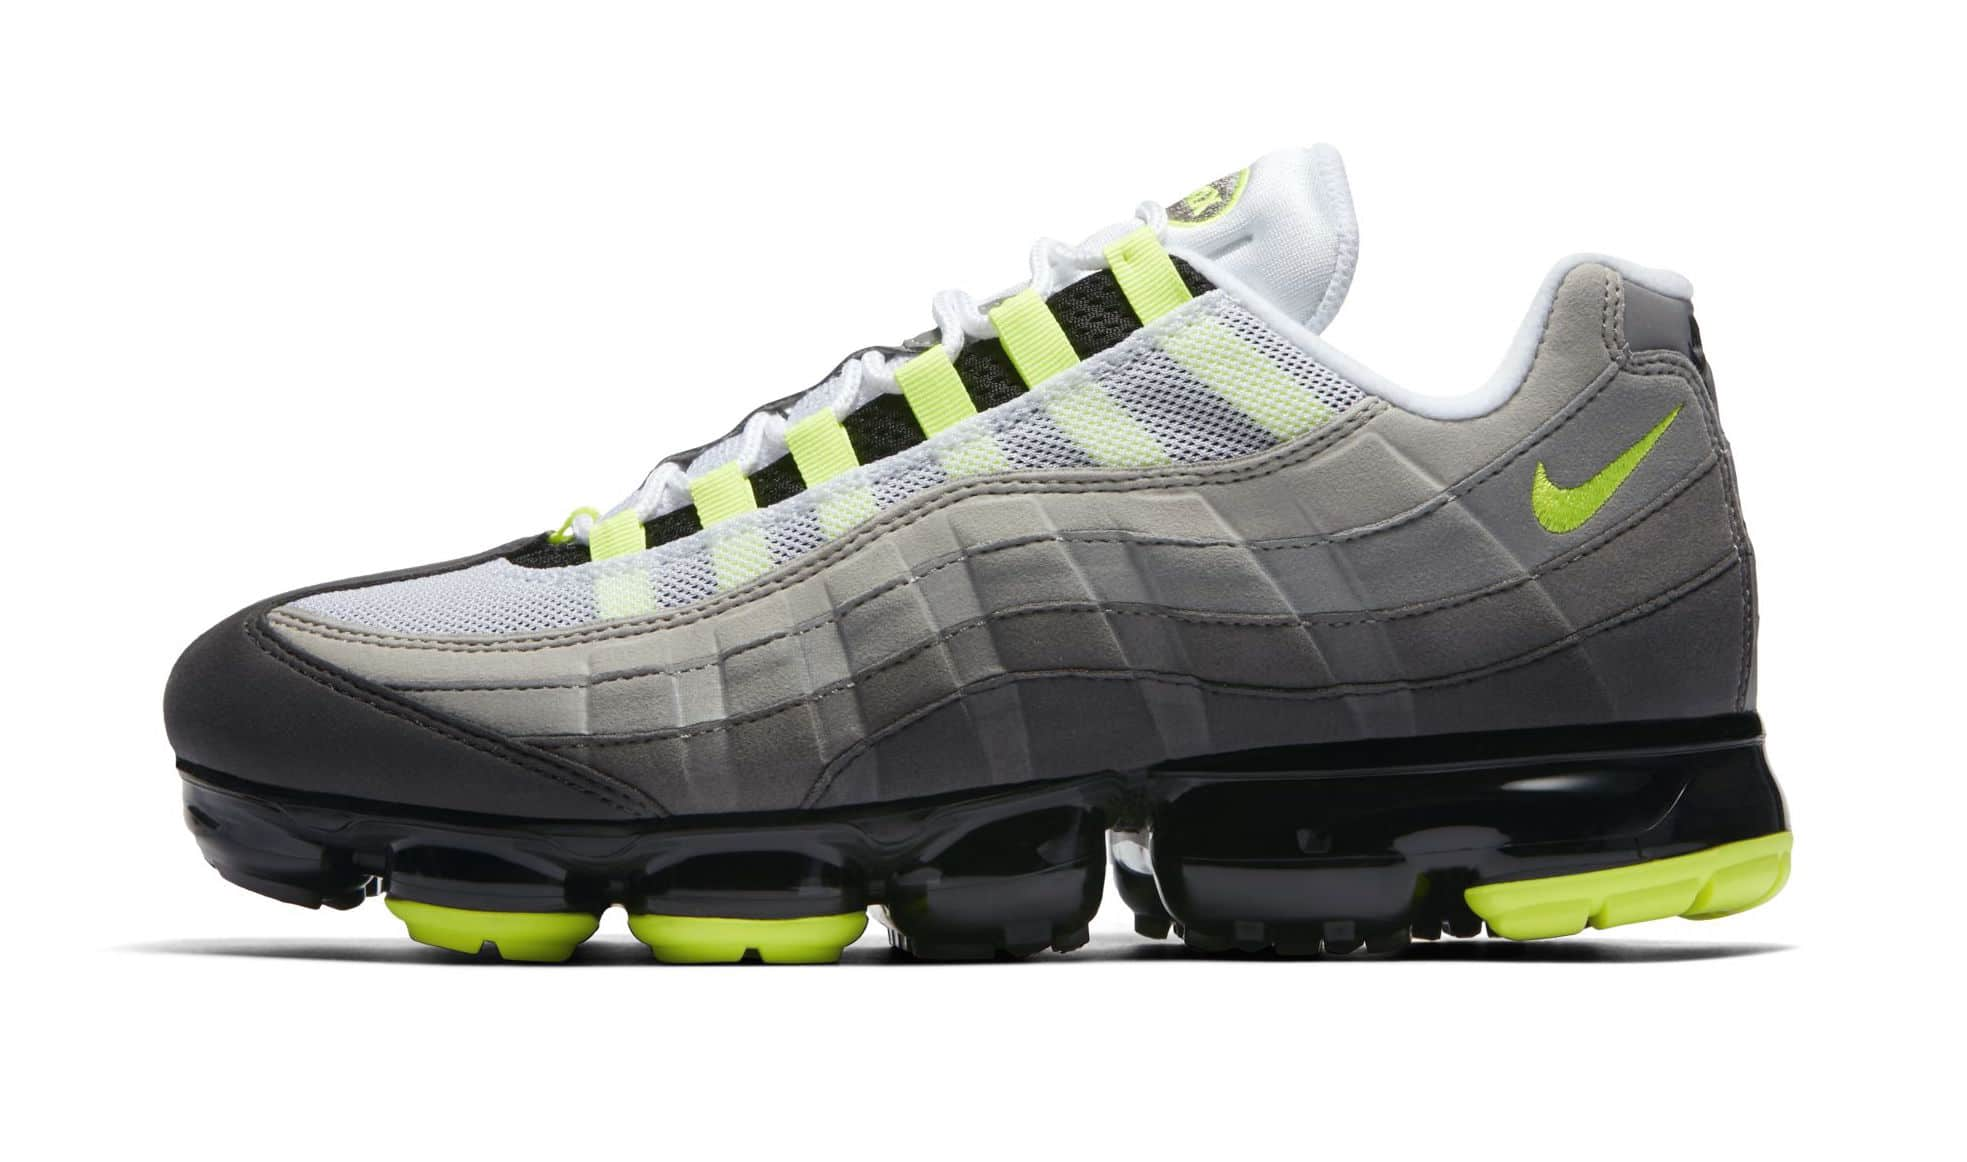 Nike Air VaporMax 95 OG Neon release date